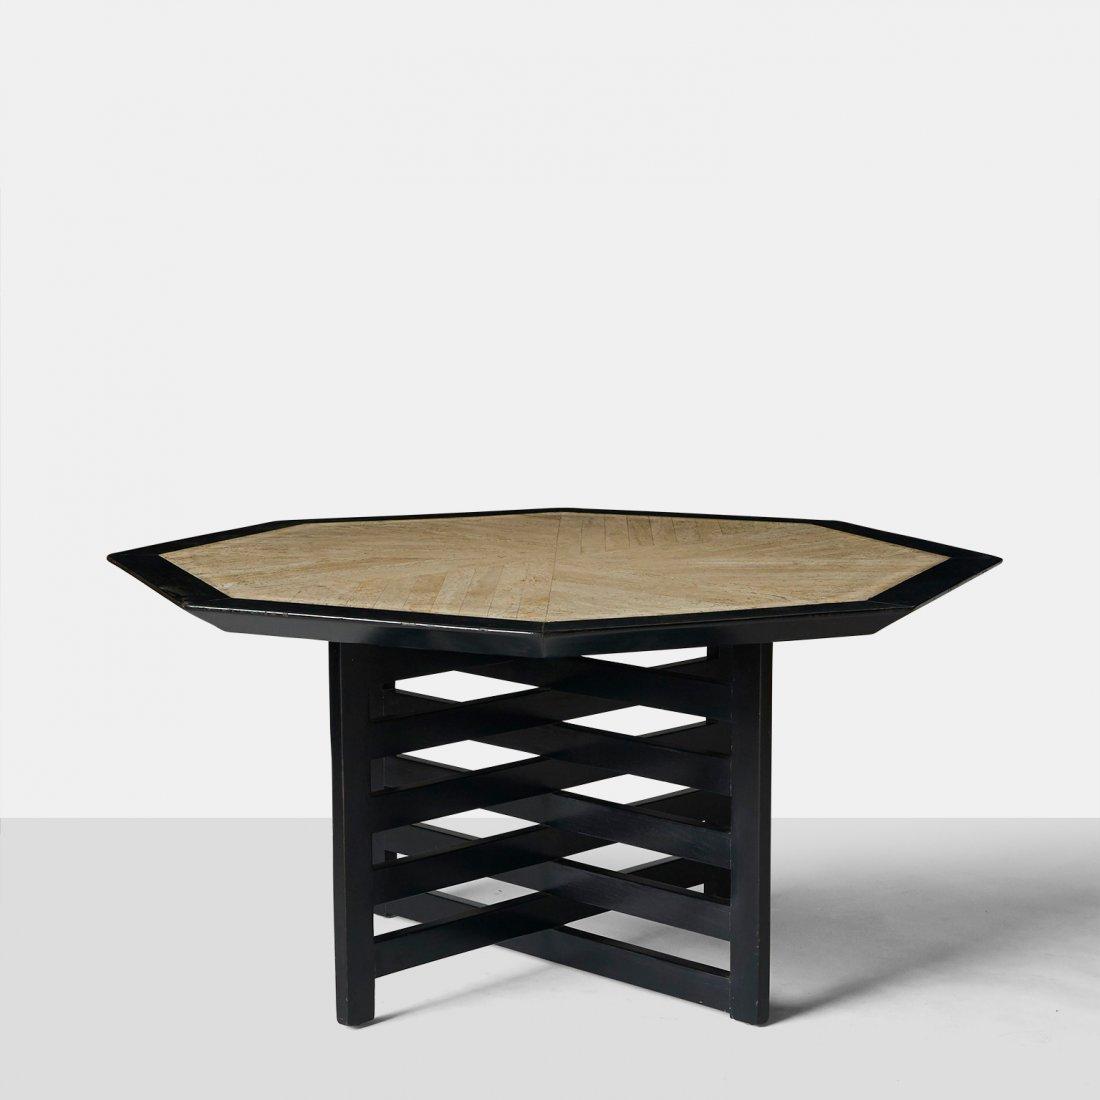 Harvey Probber, Dining Table for Probber for Modern